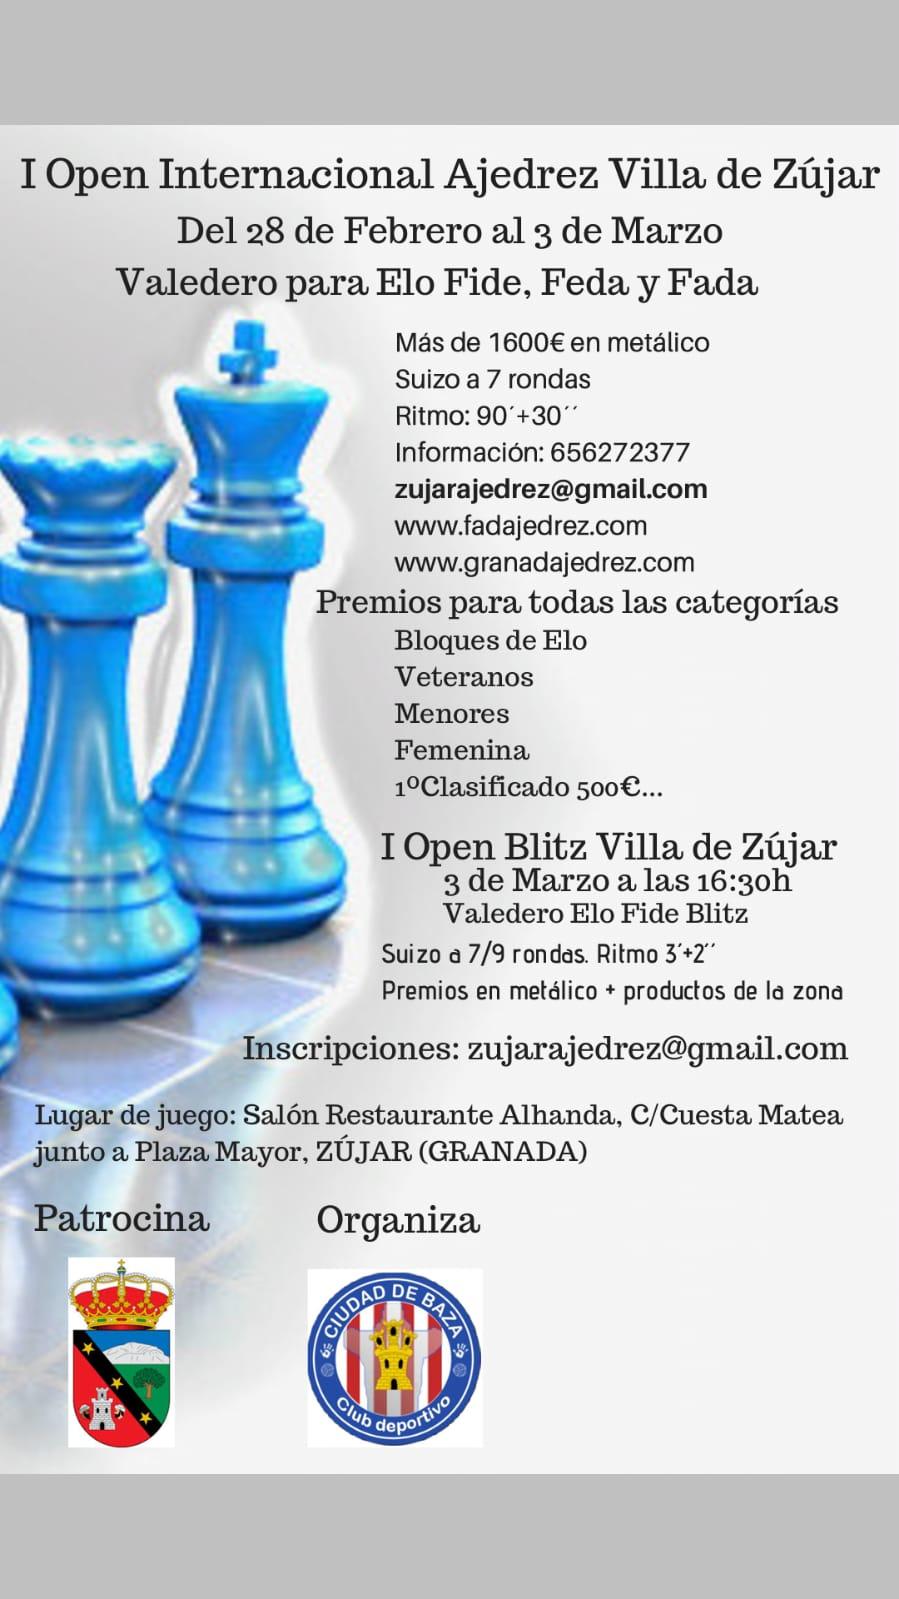 I Open Internacional Villa de Zujar